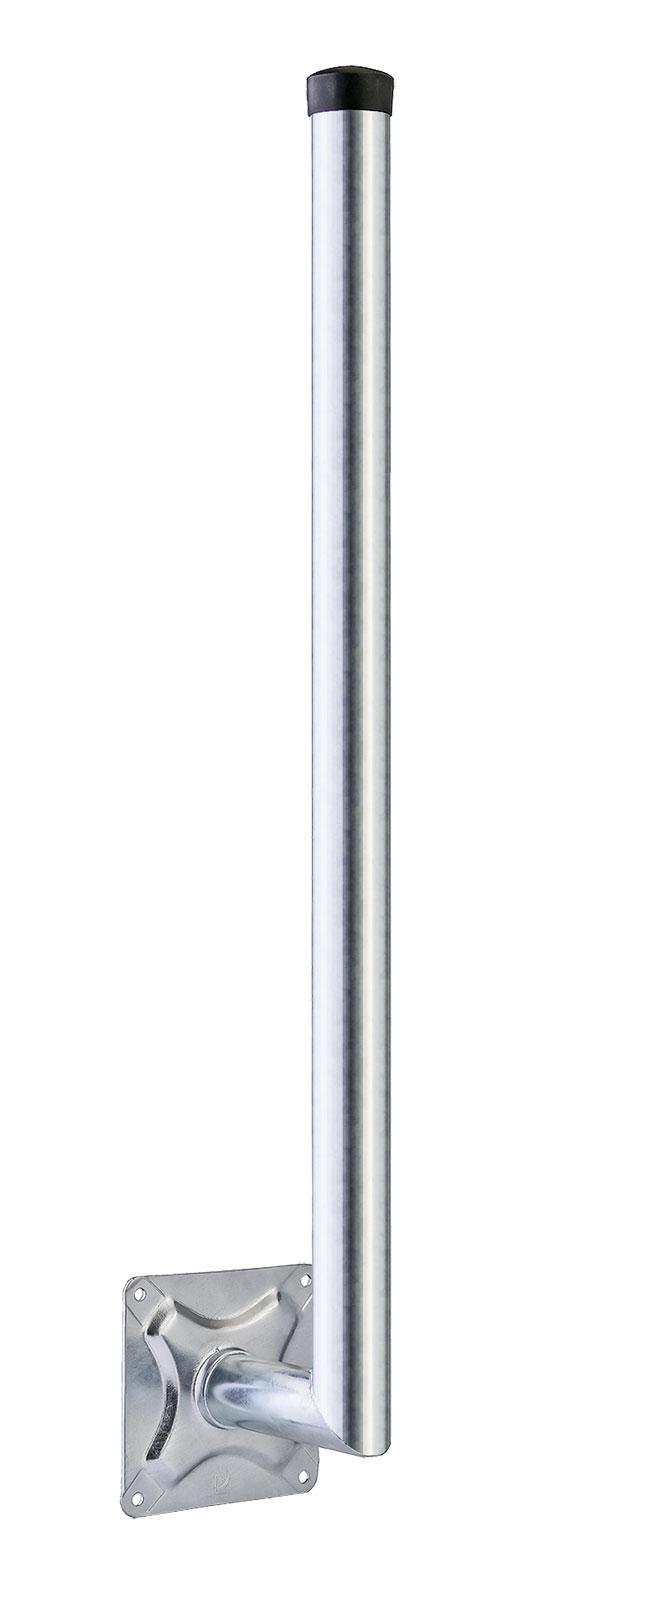 70cm Wandhalter Stahl Große Wandplatte SAT Wand Halter 15 x 15cm